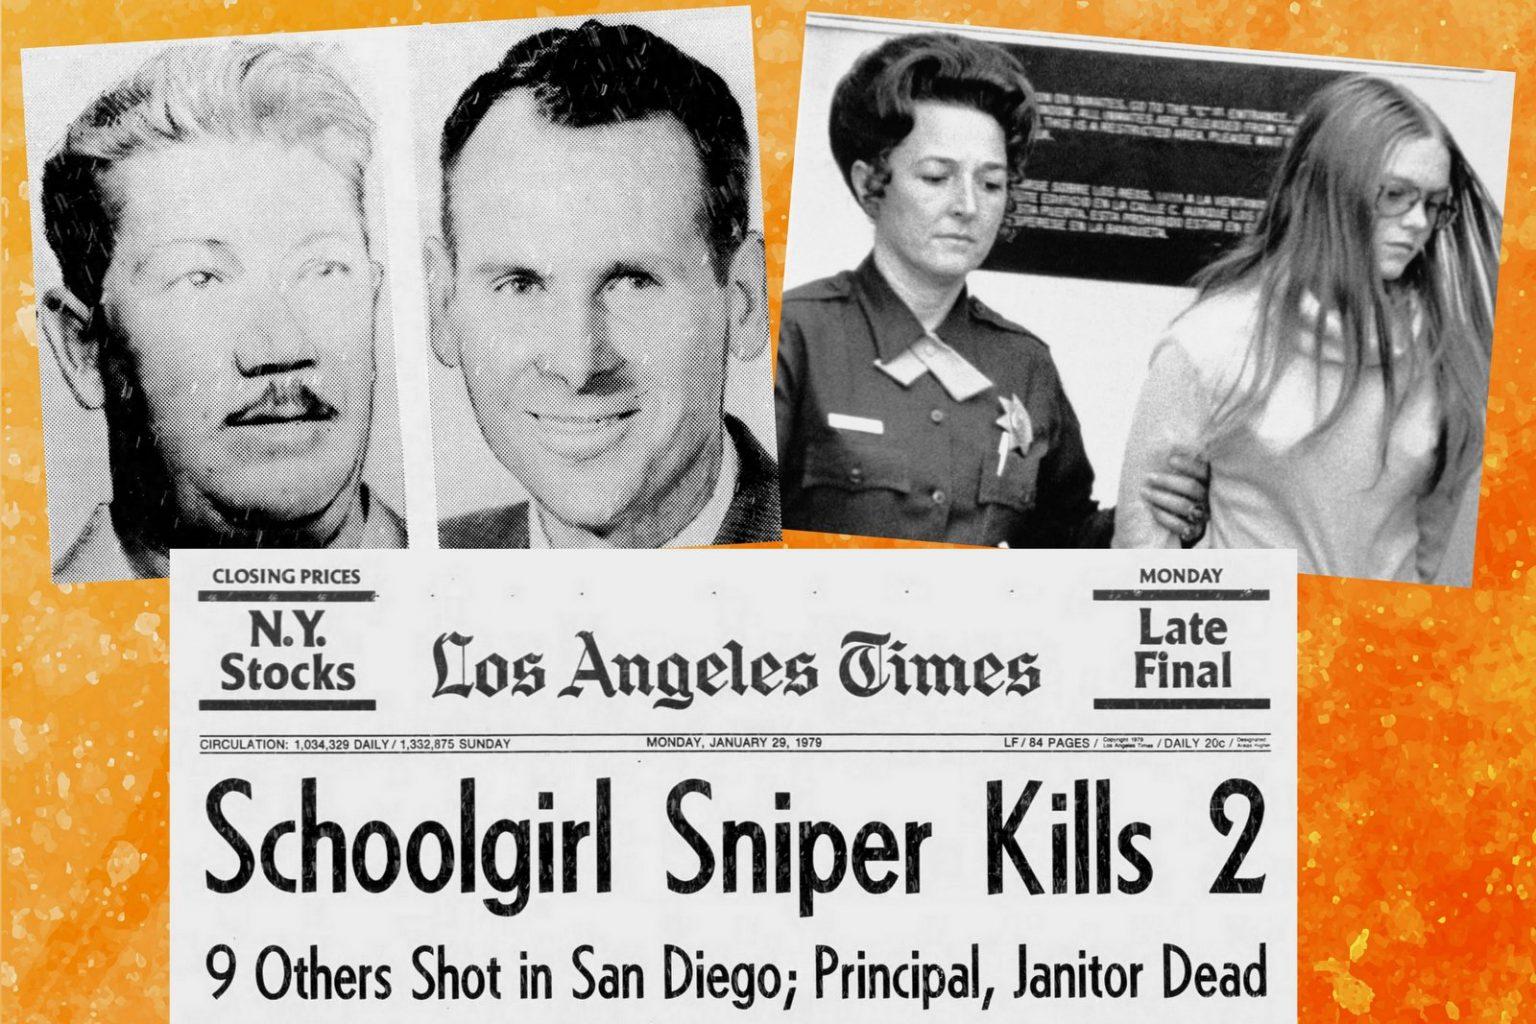 San Diego school shooting in 1979 Why Shooter, a teenage girl, said she didn't like Mondays